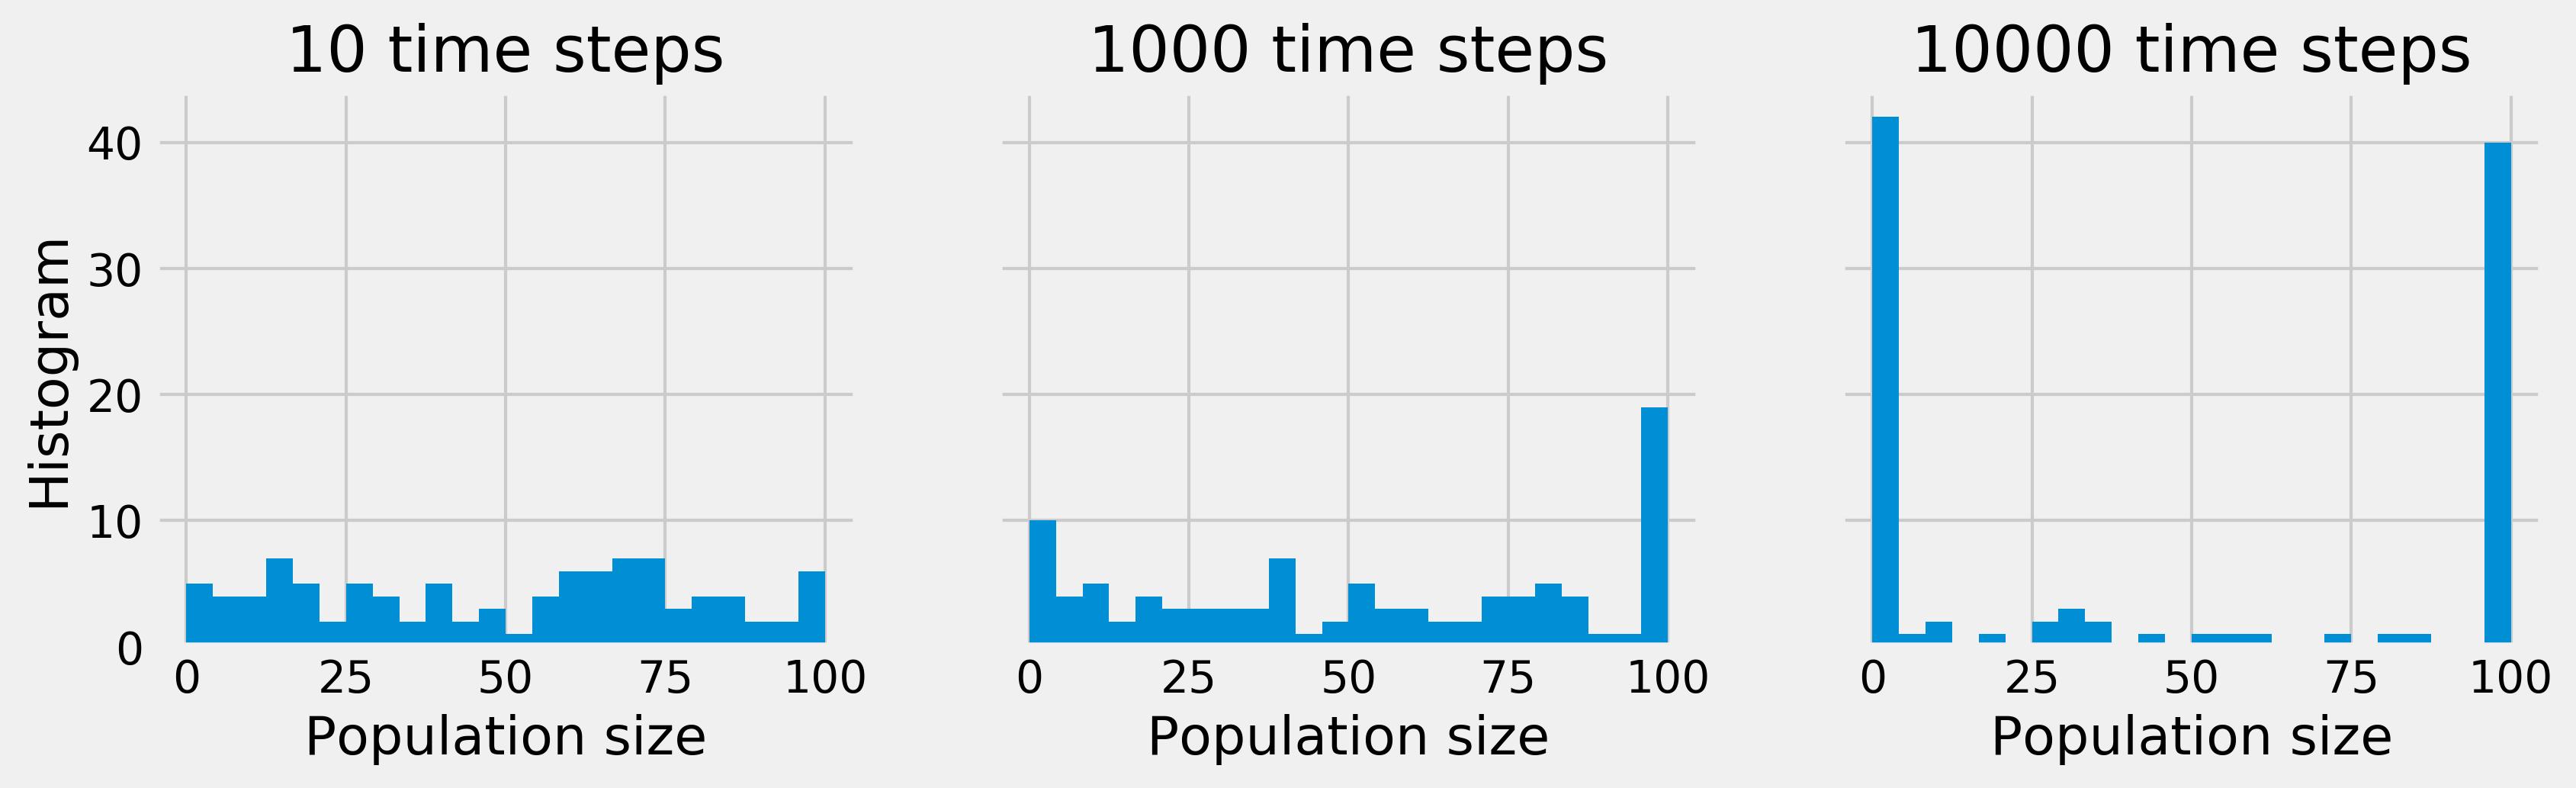 <matplotlib.figure.Figure at 0x6c71748>